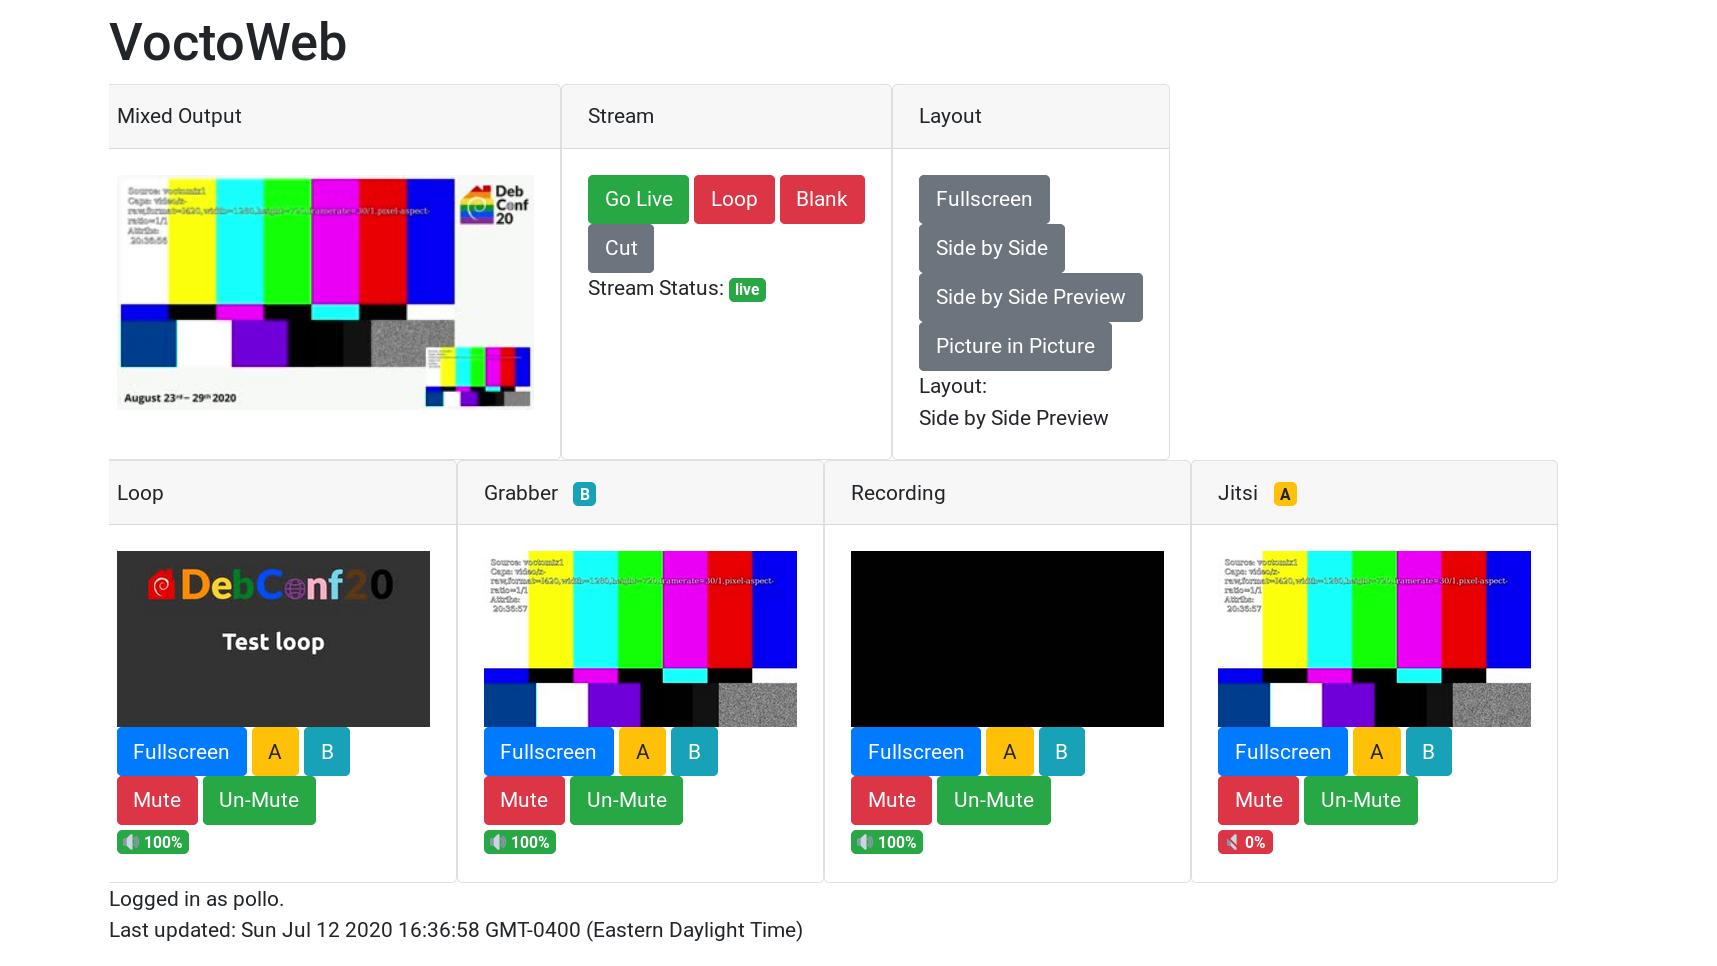 The new Python3 voctoweb